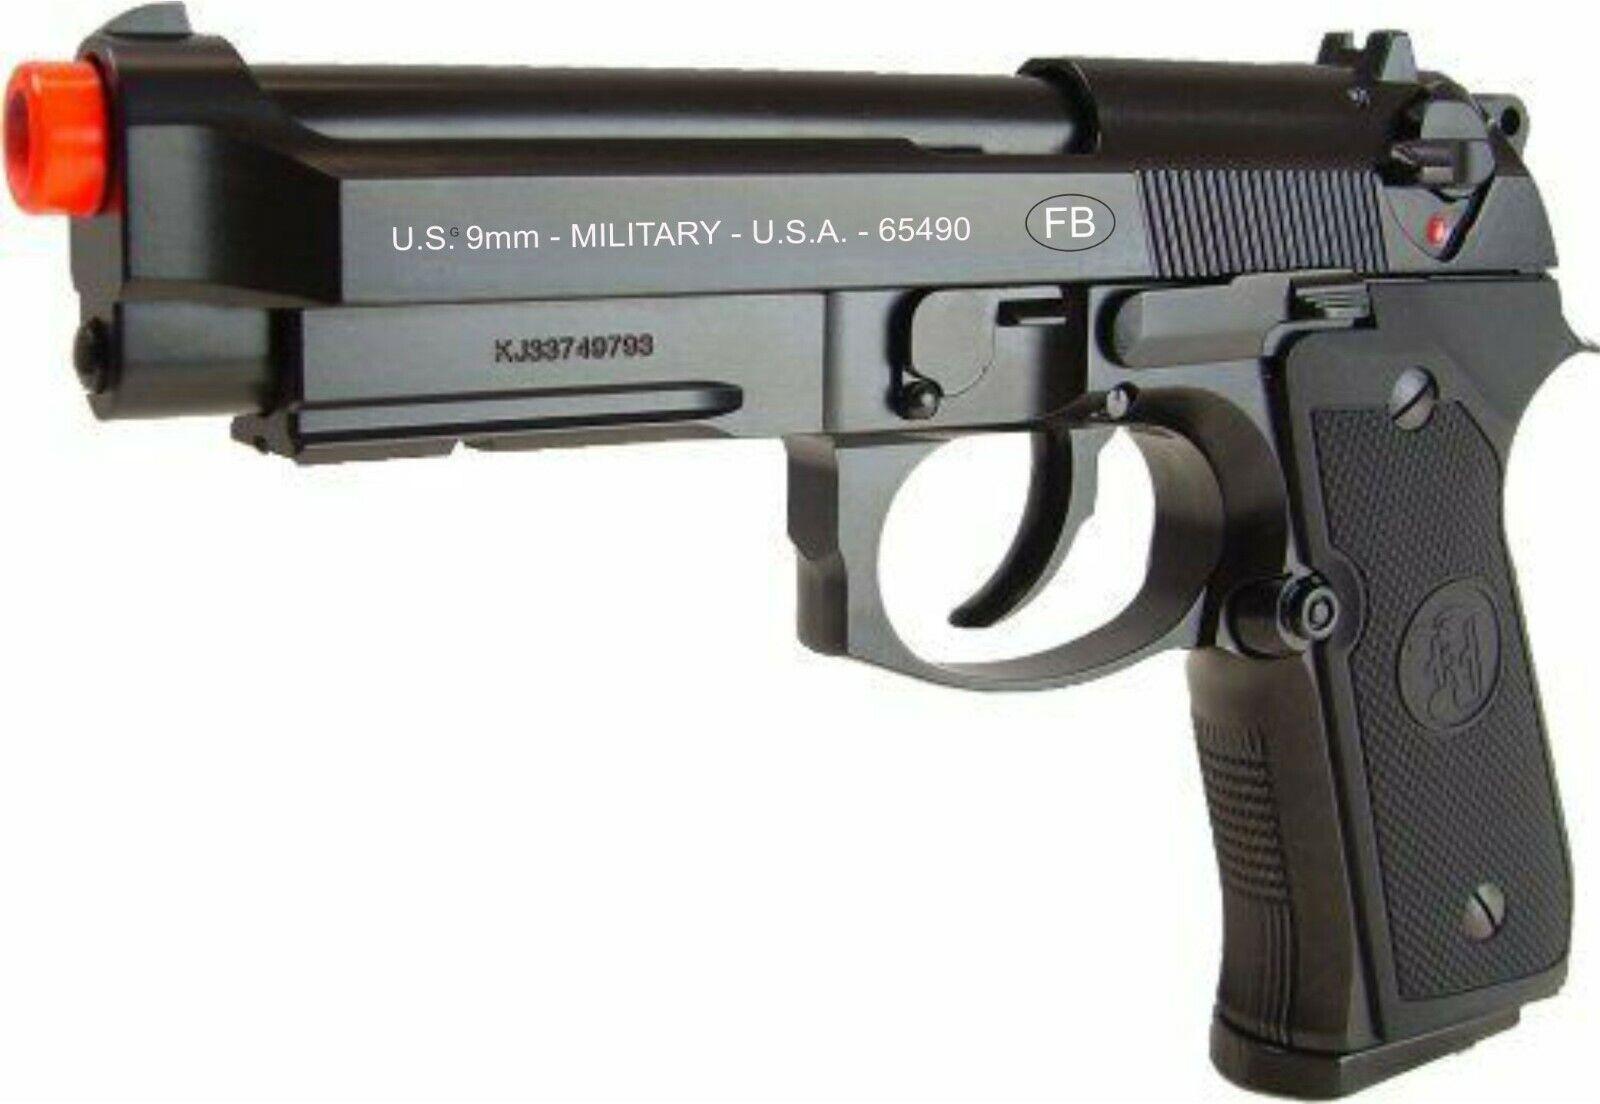 Fn Herstal Full Metal Airsoft Gun Fnx 45 Tactical Co2 Gas Blowback Gbb Pistol For Sale Online Ebay